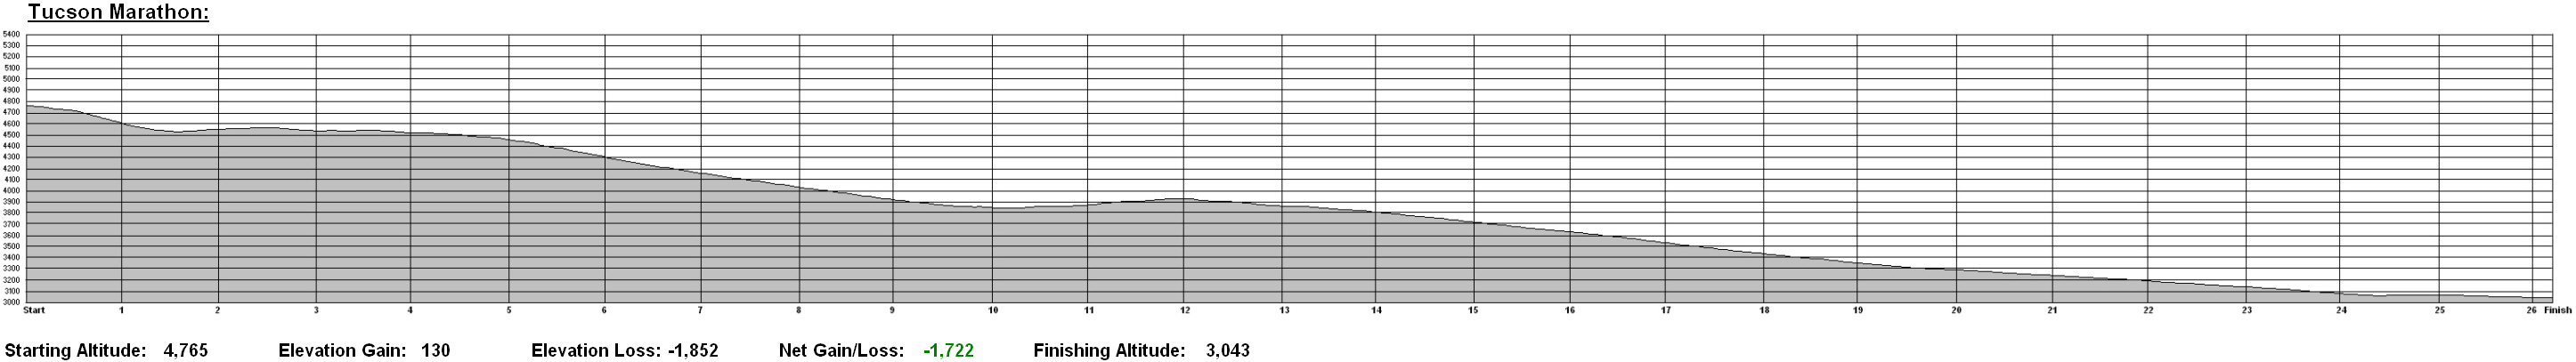 Tuscon Marathon